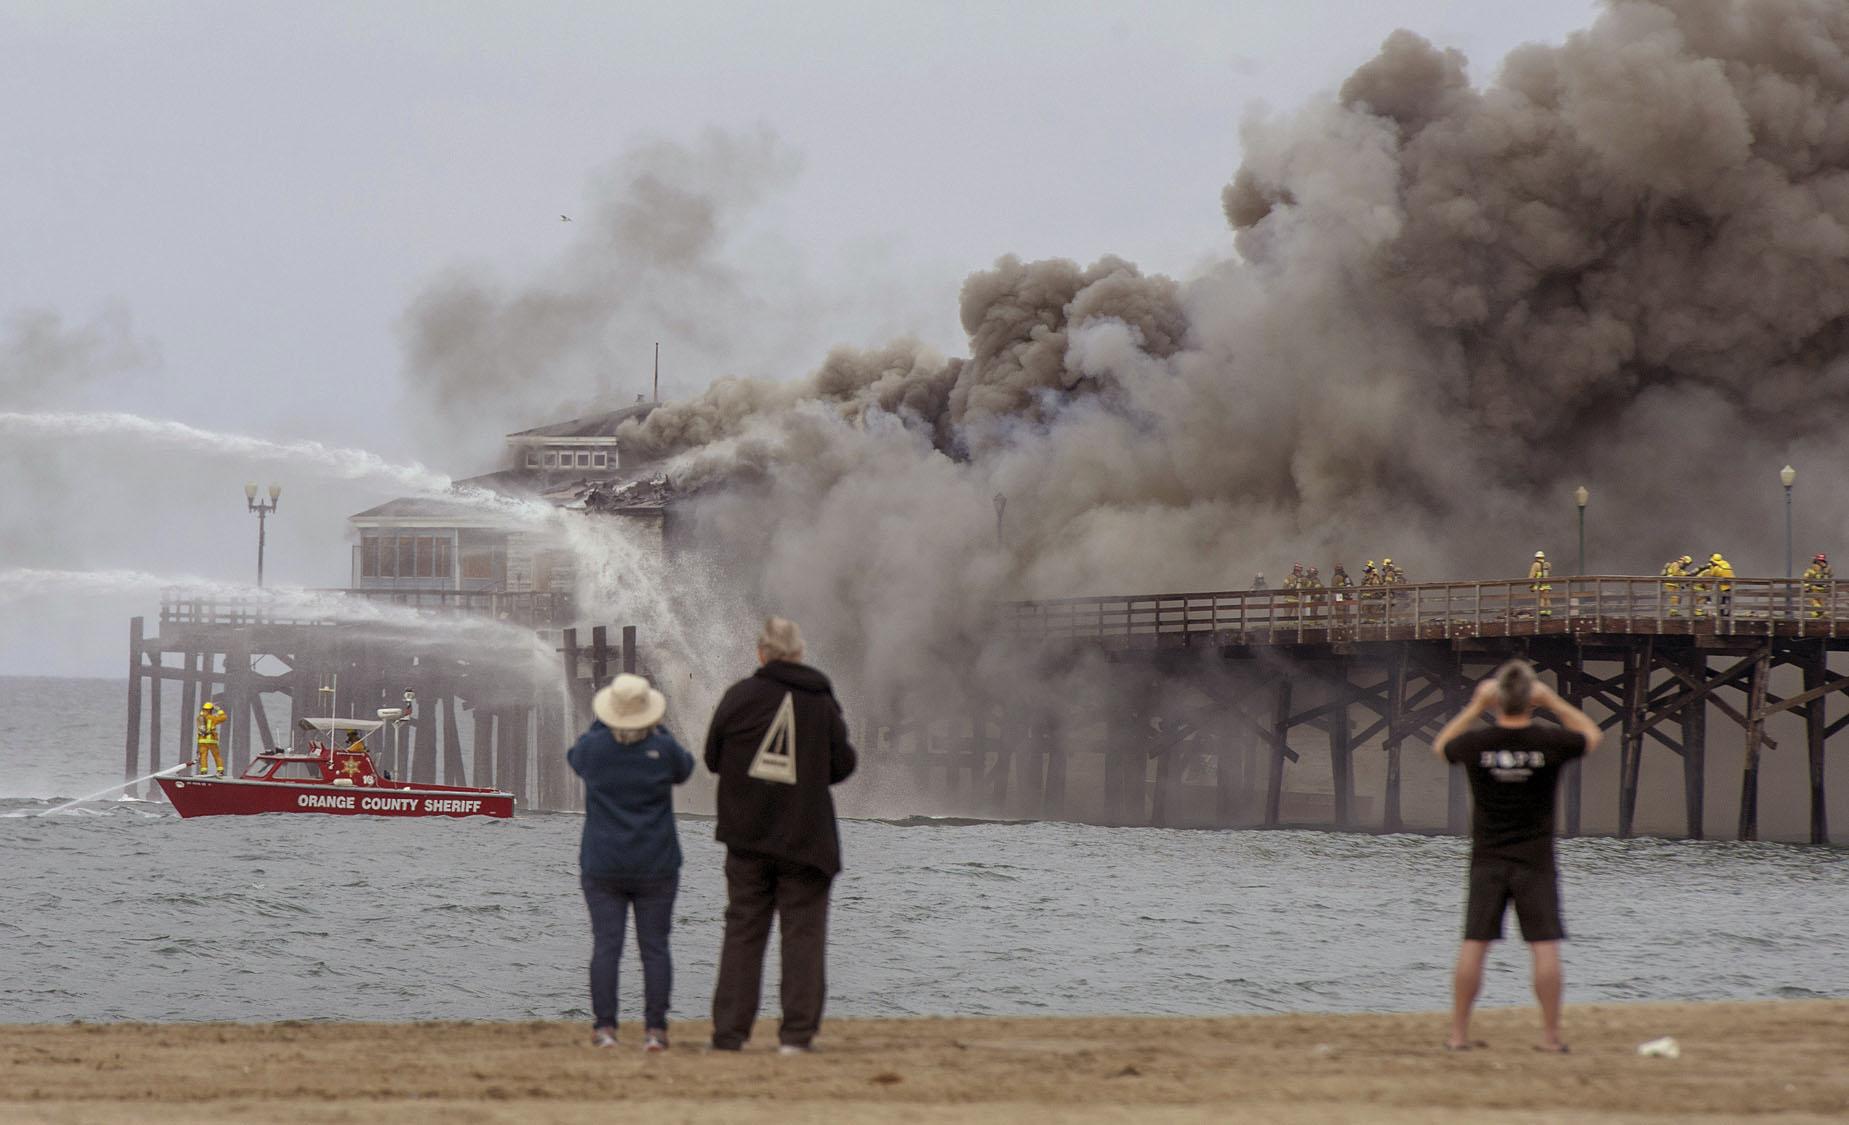 Fire engulfs abandoned restaurant on California pier